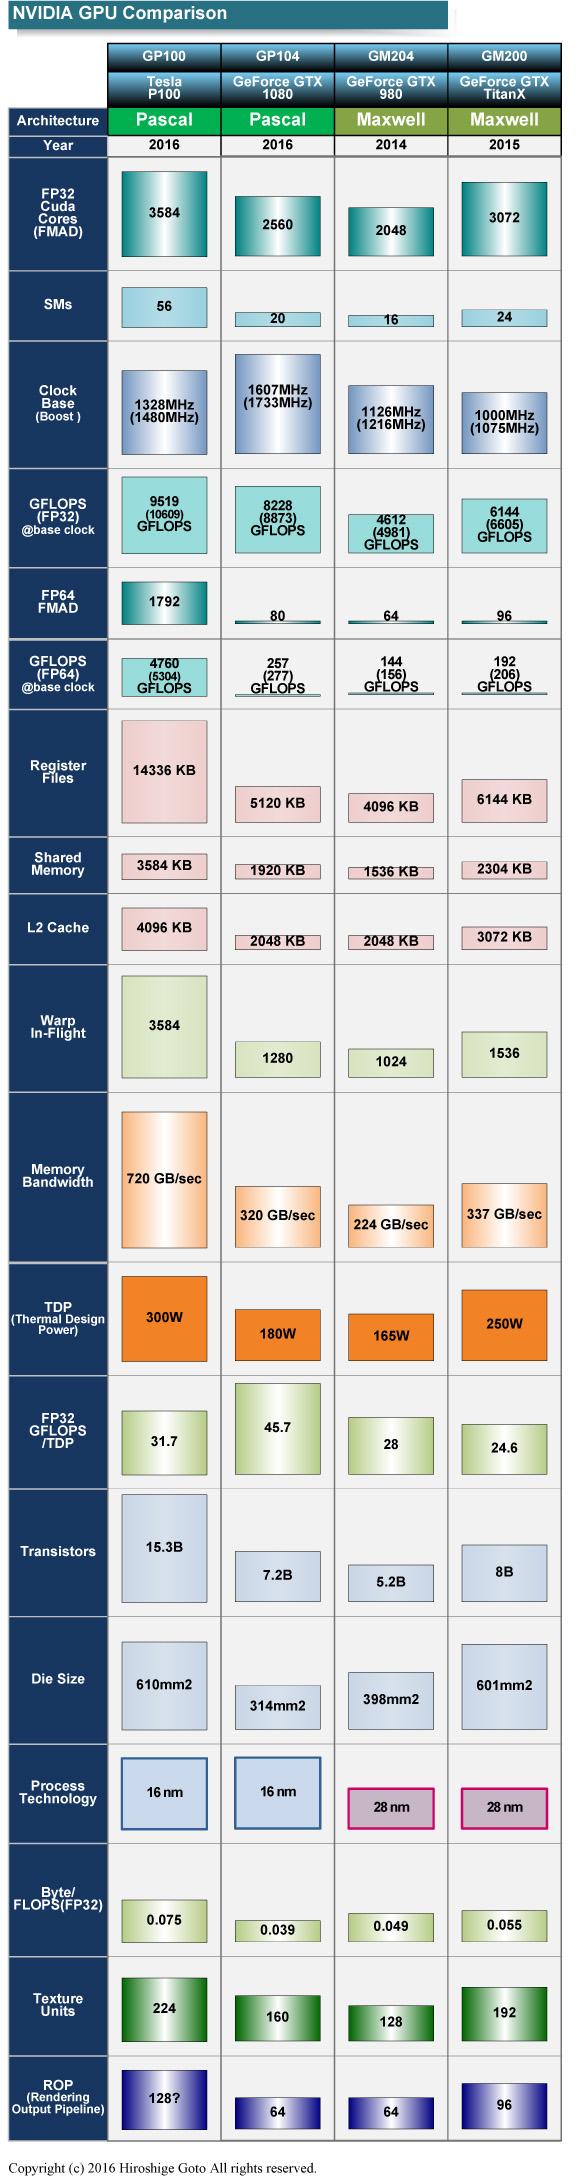 "MaxwellとPascalの両世代のGPUスペック比較<br class="""">PDF版は<span class=""img-inline raw""><a href=""/video/pcw/docs/757/916/p2.pdf"" ipw_status=""1"" ipw_linktype=""filelink_raw"" class=""resource"">こちら</a></span>"